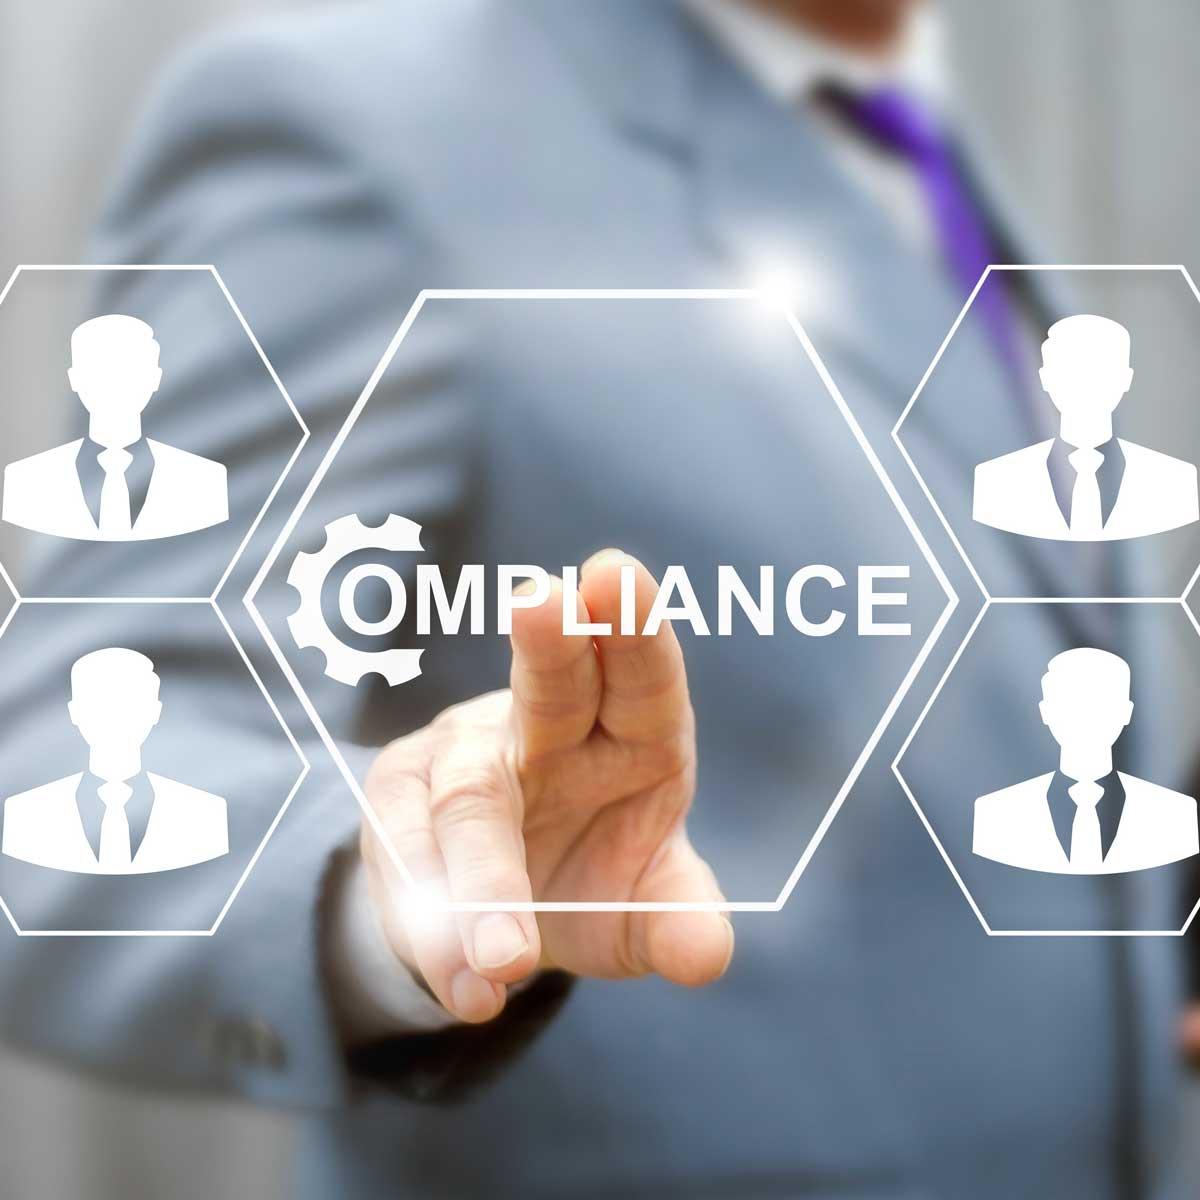 Business compliance teamwork service web concept